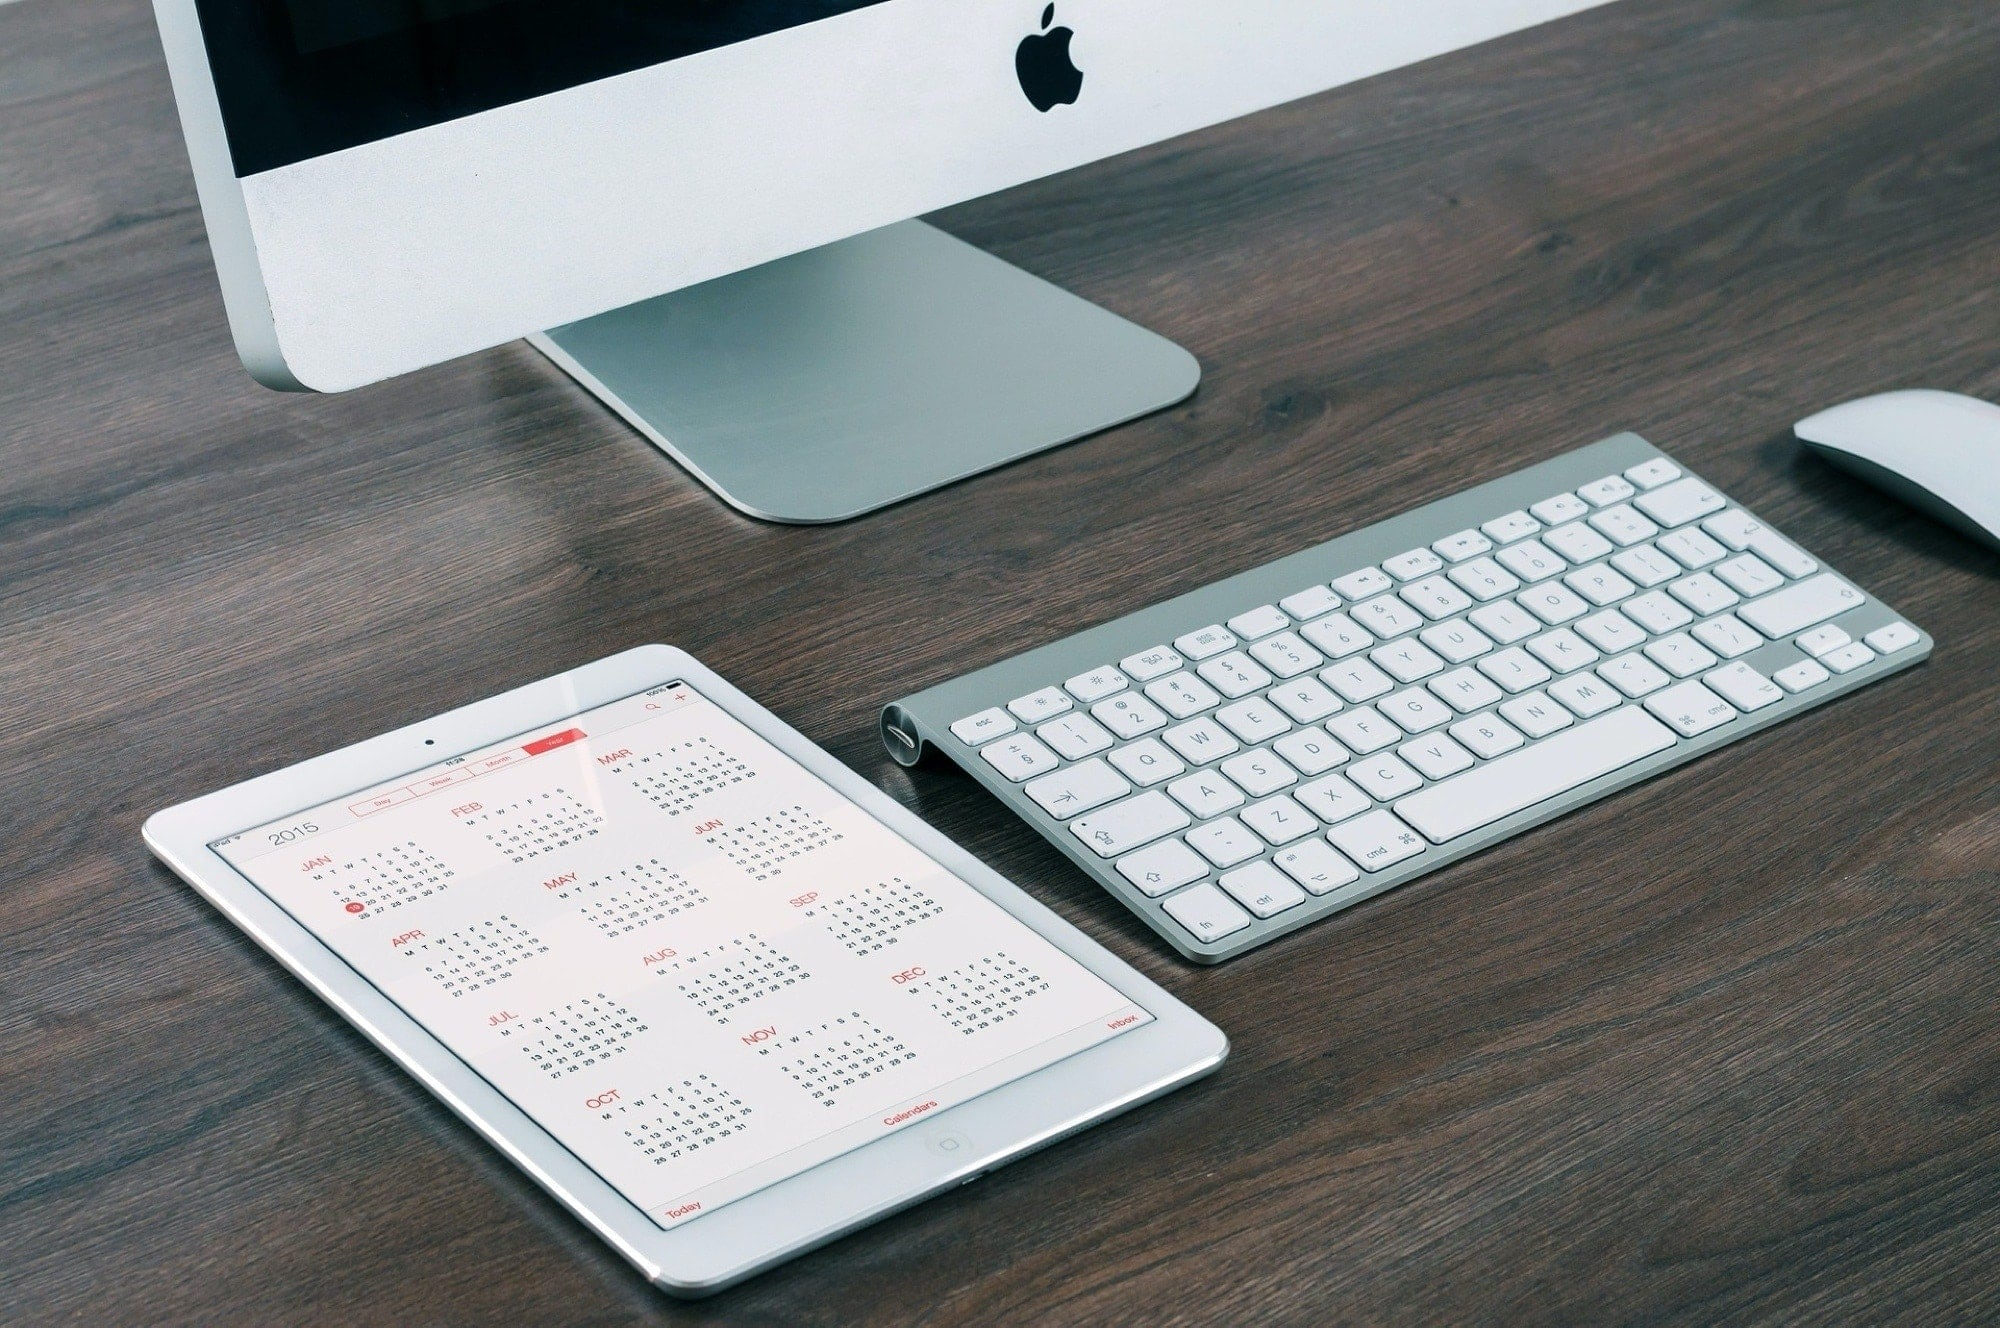 iMac keyboard iPad Calendar - Calendar keyboard shortcuts